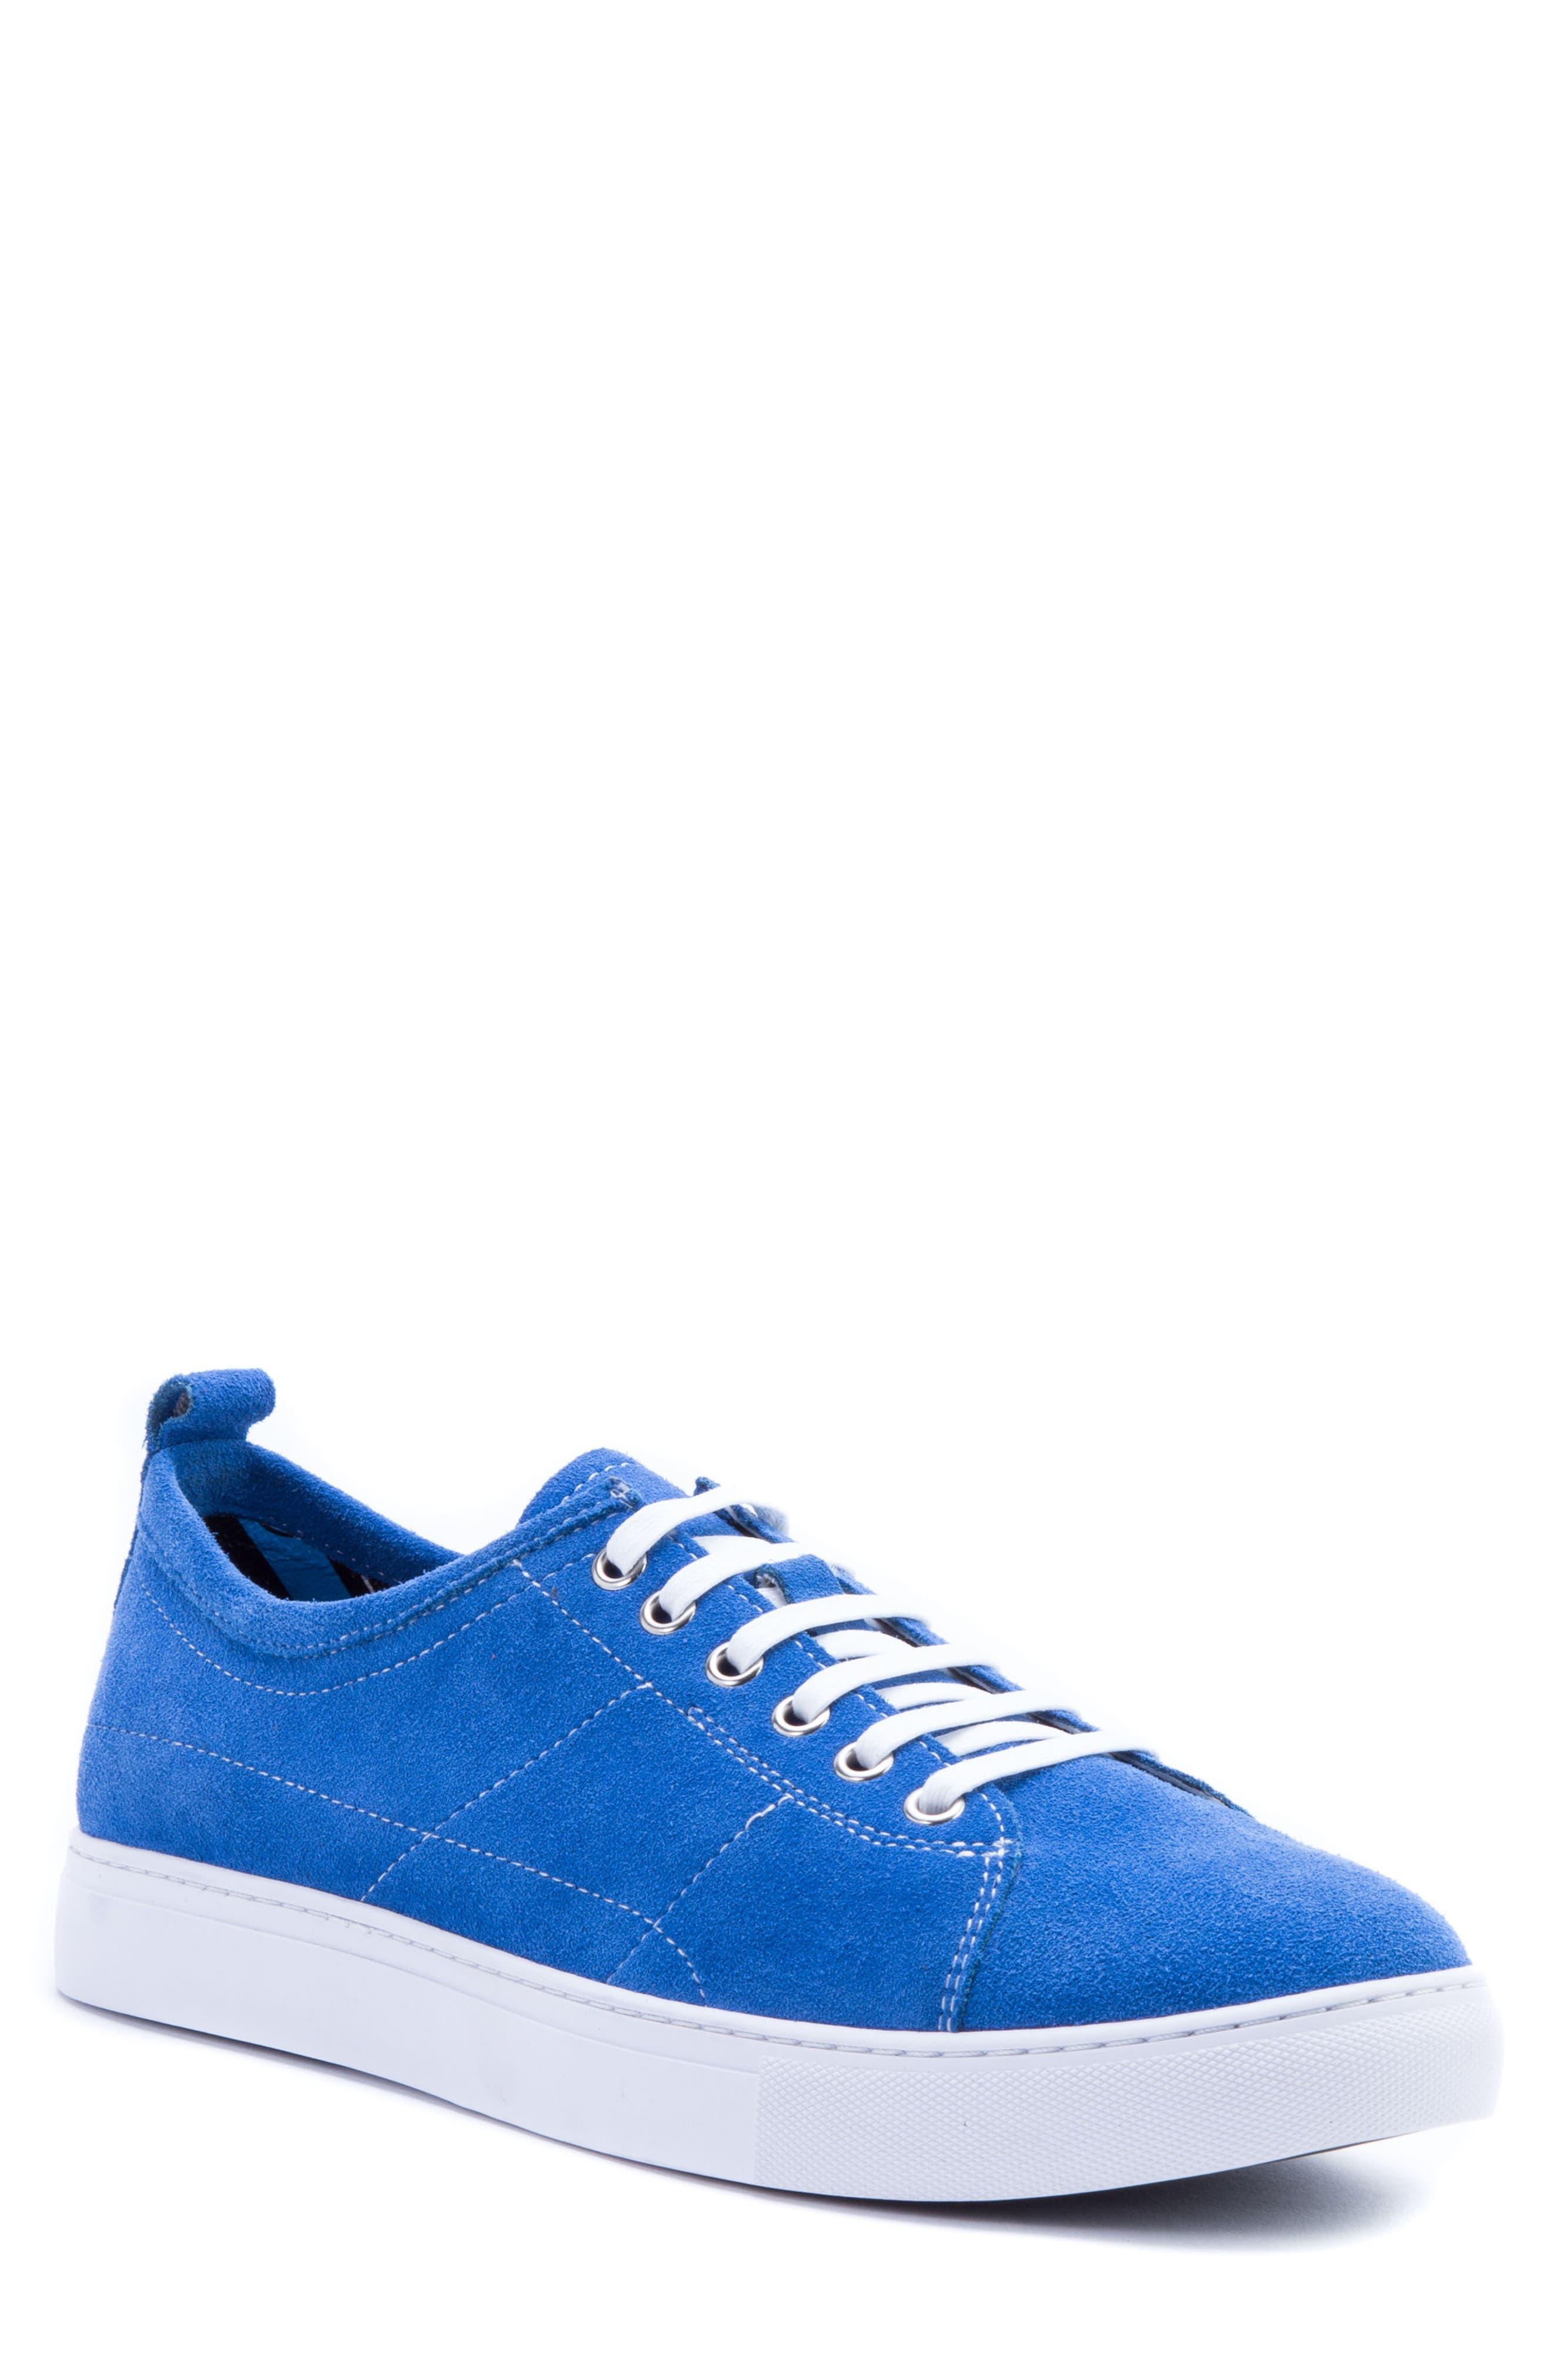 Ernesto Low Top Sneaker,                             Main thumbnail 1, color,                             ROYAL SUEDE